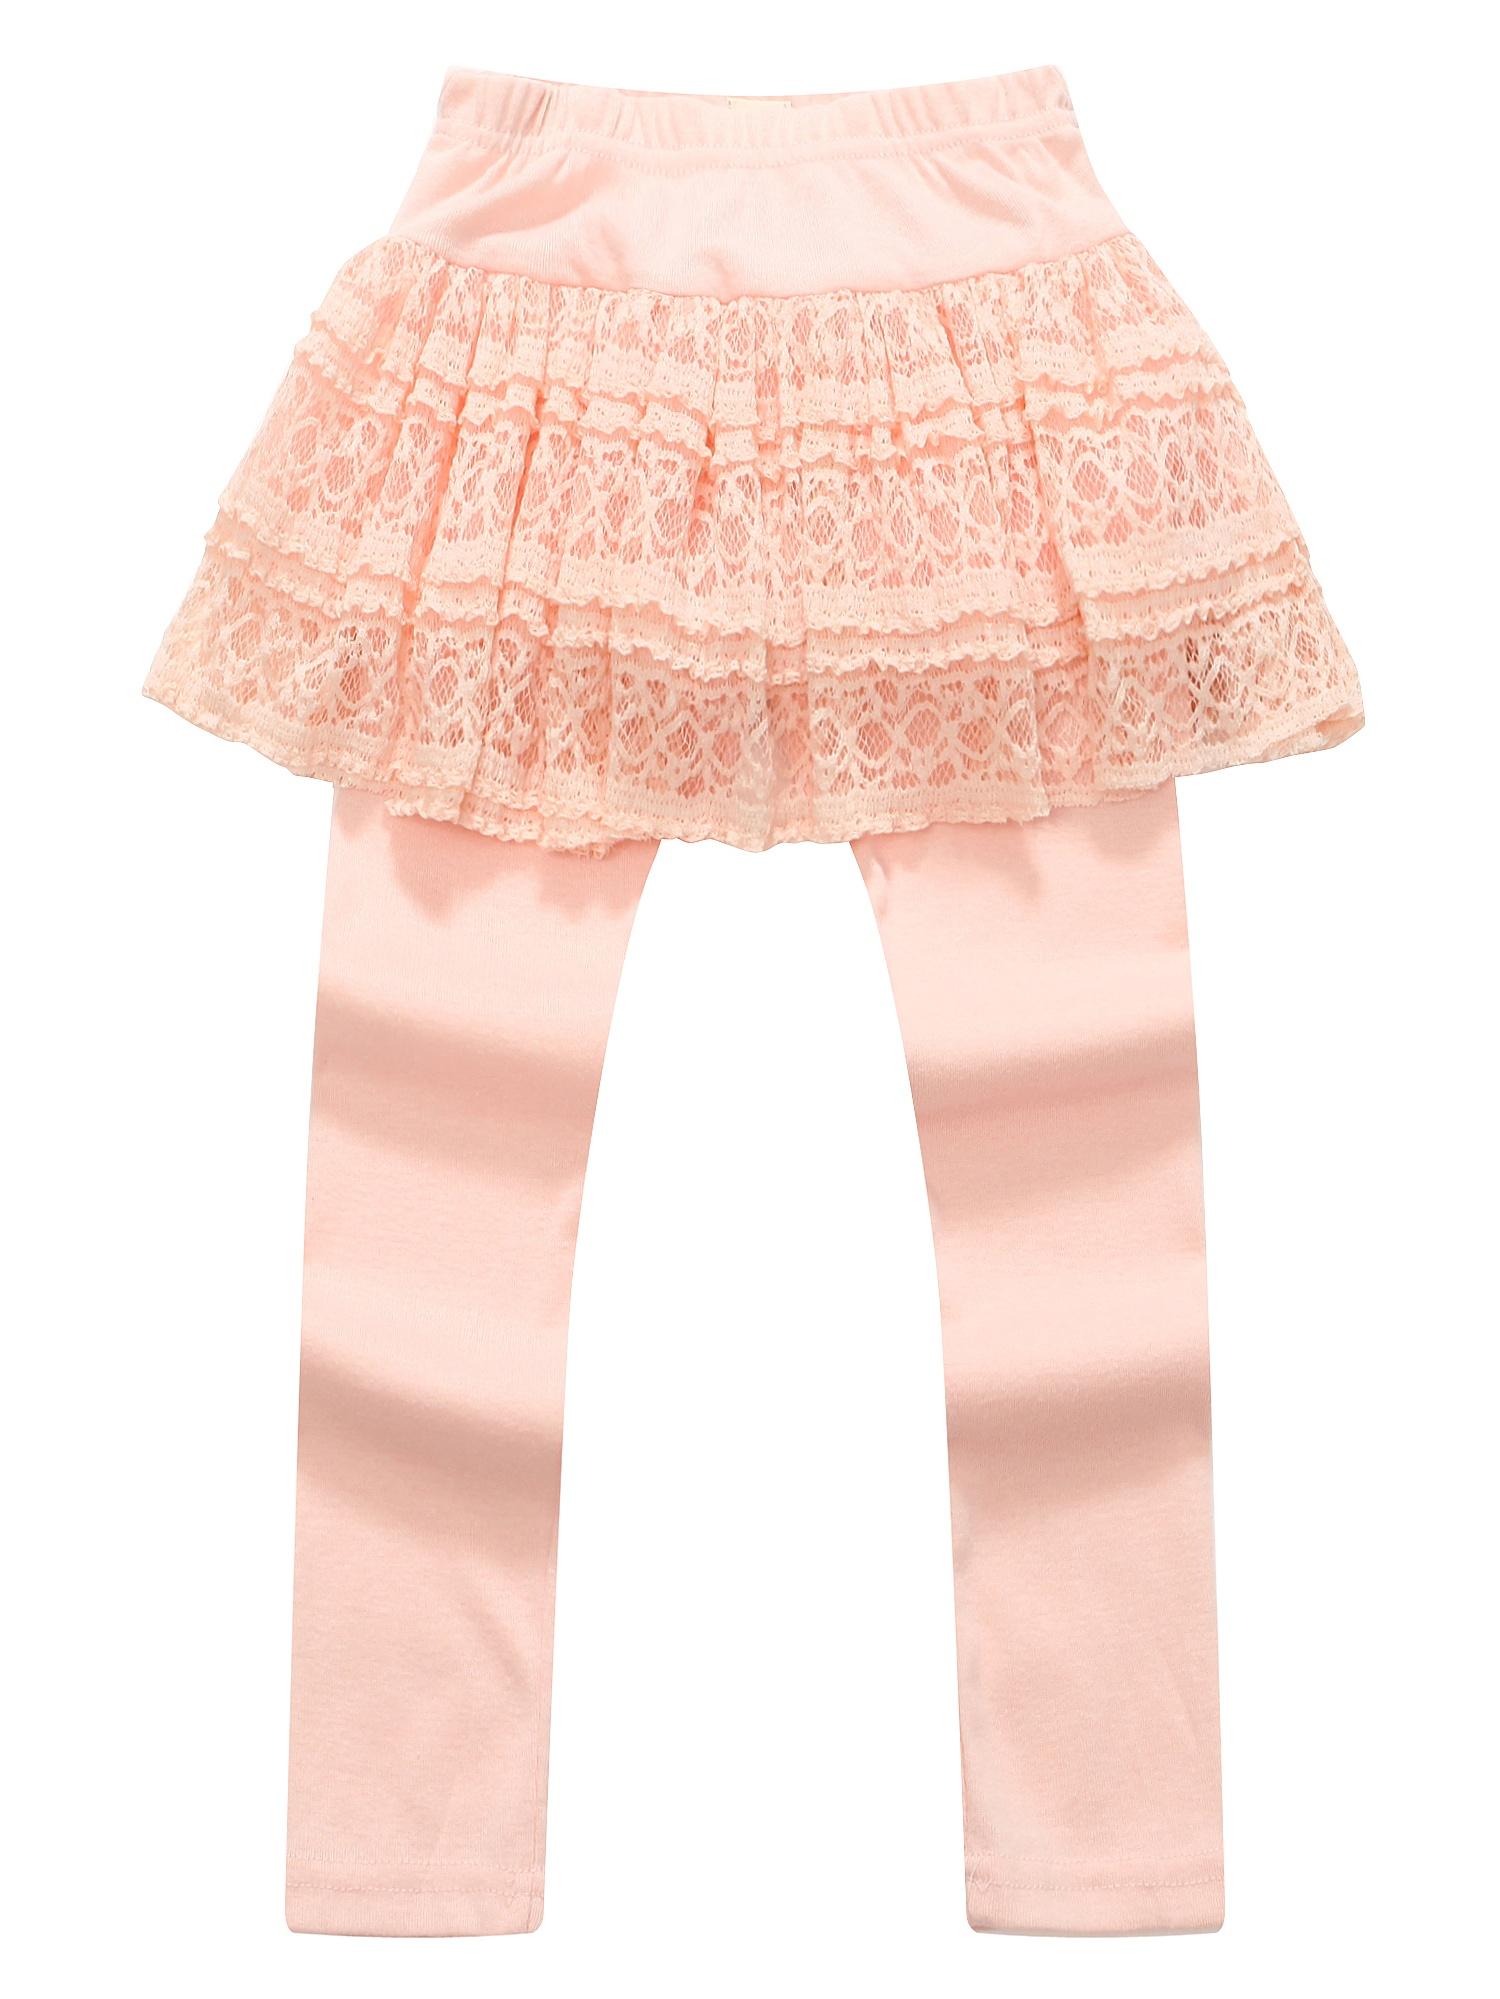 Richie House Girls' Leggings with Lace Tutu-style Skirt RH0882